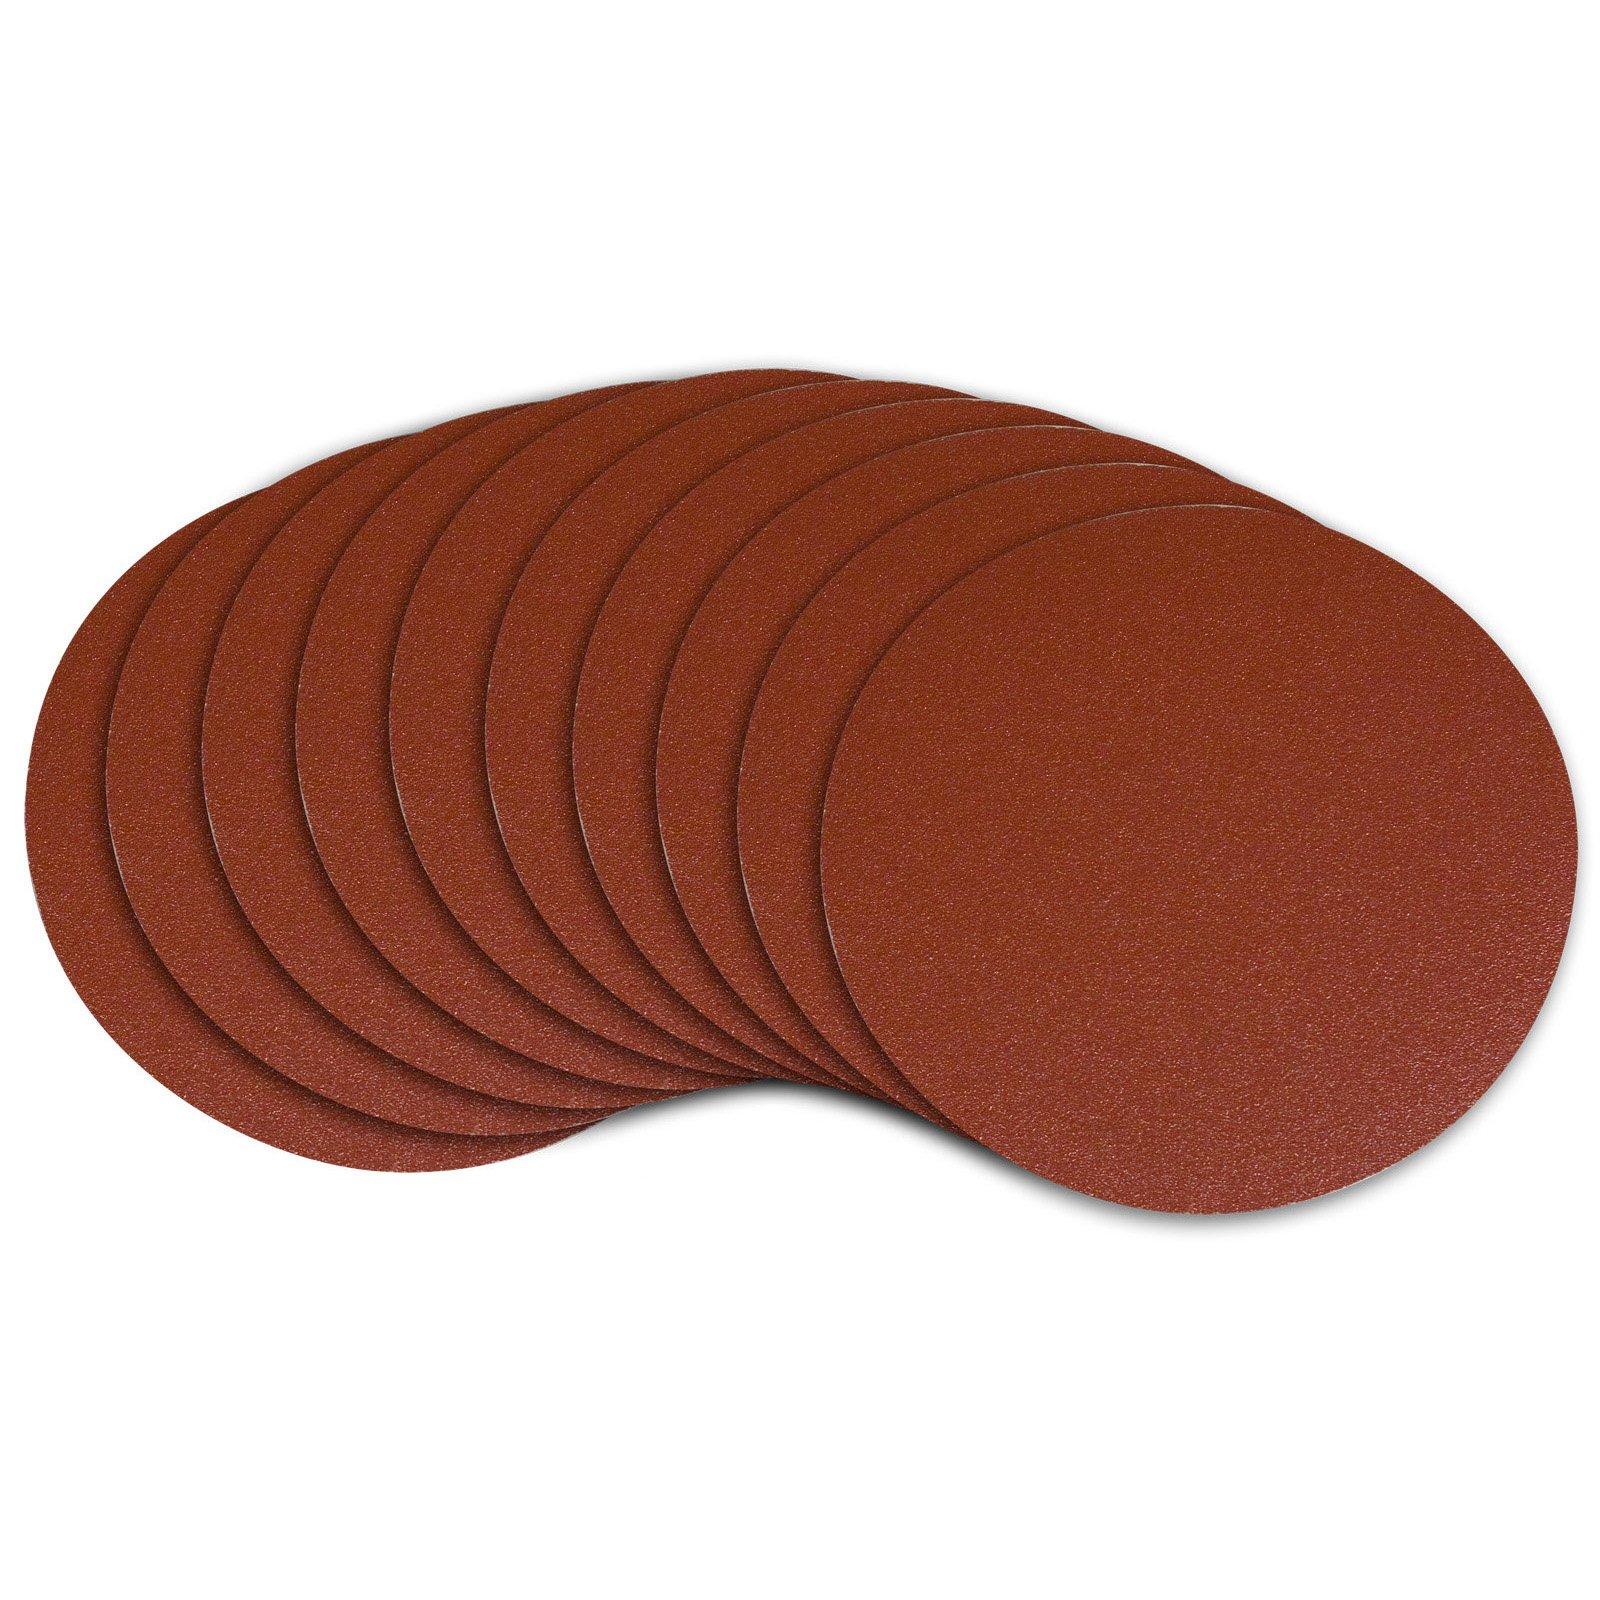 5 Each of 80 100 120 180 240 400 Self Stick Dyna-Living 30 PCS 9-Inch NO-Hole PSA Aluminum Oxide Sanding Disc